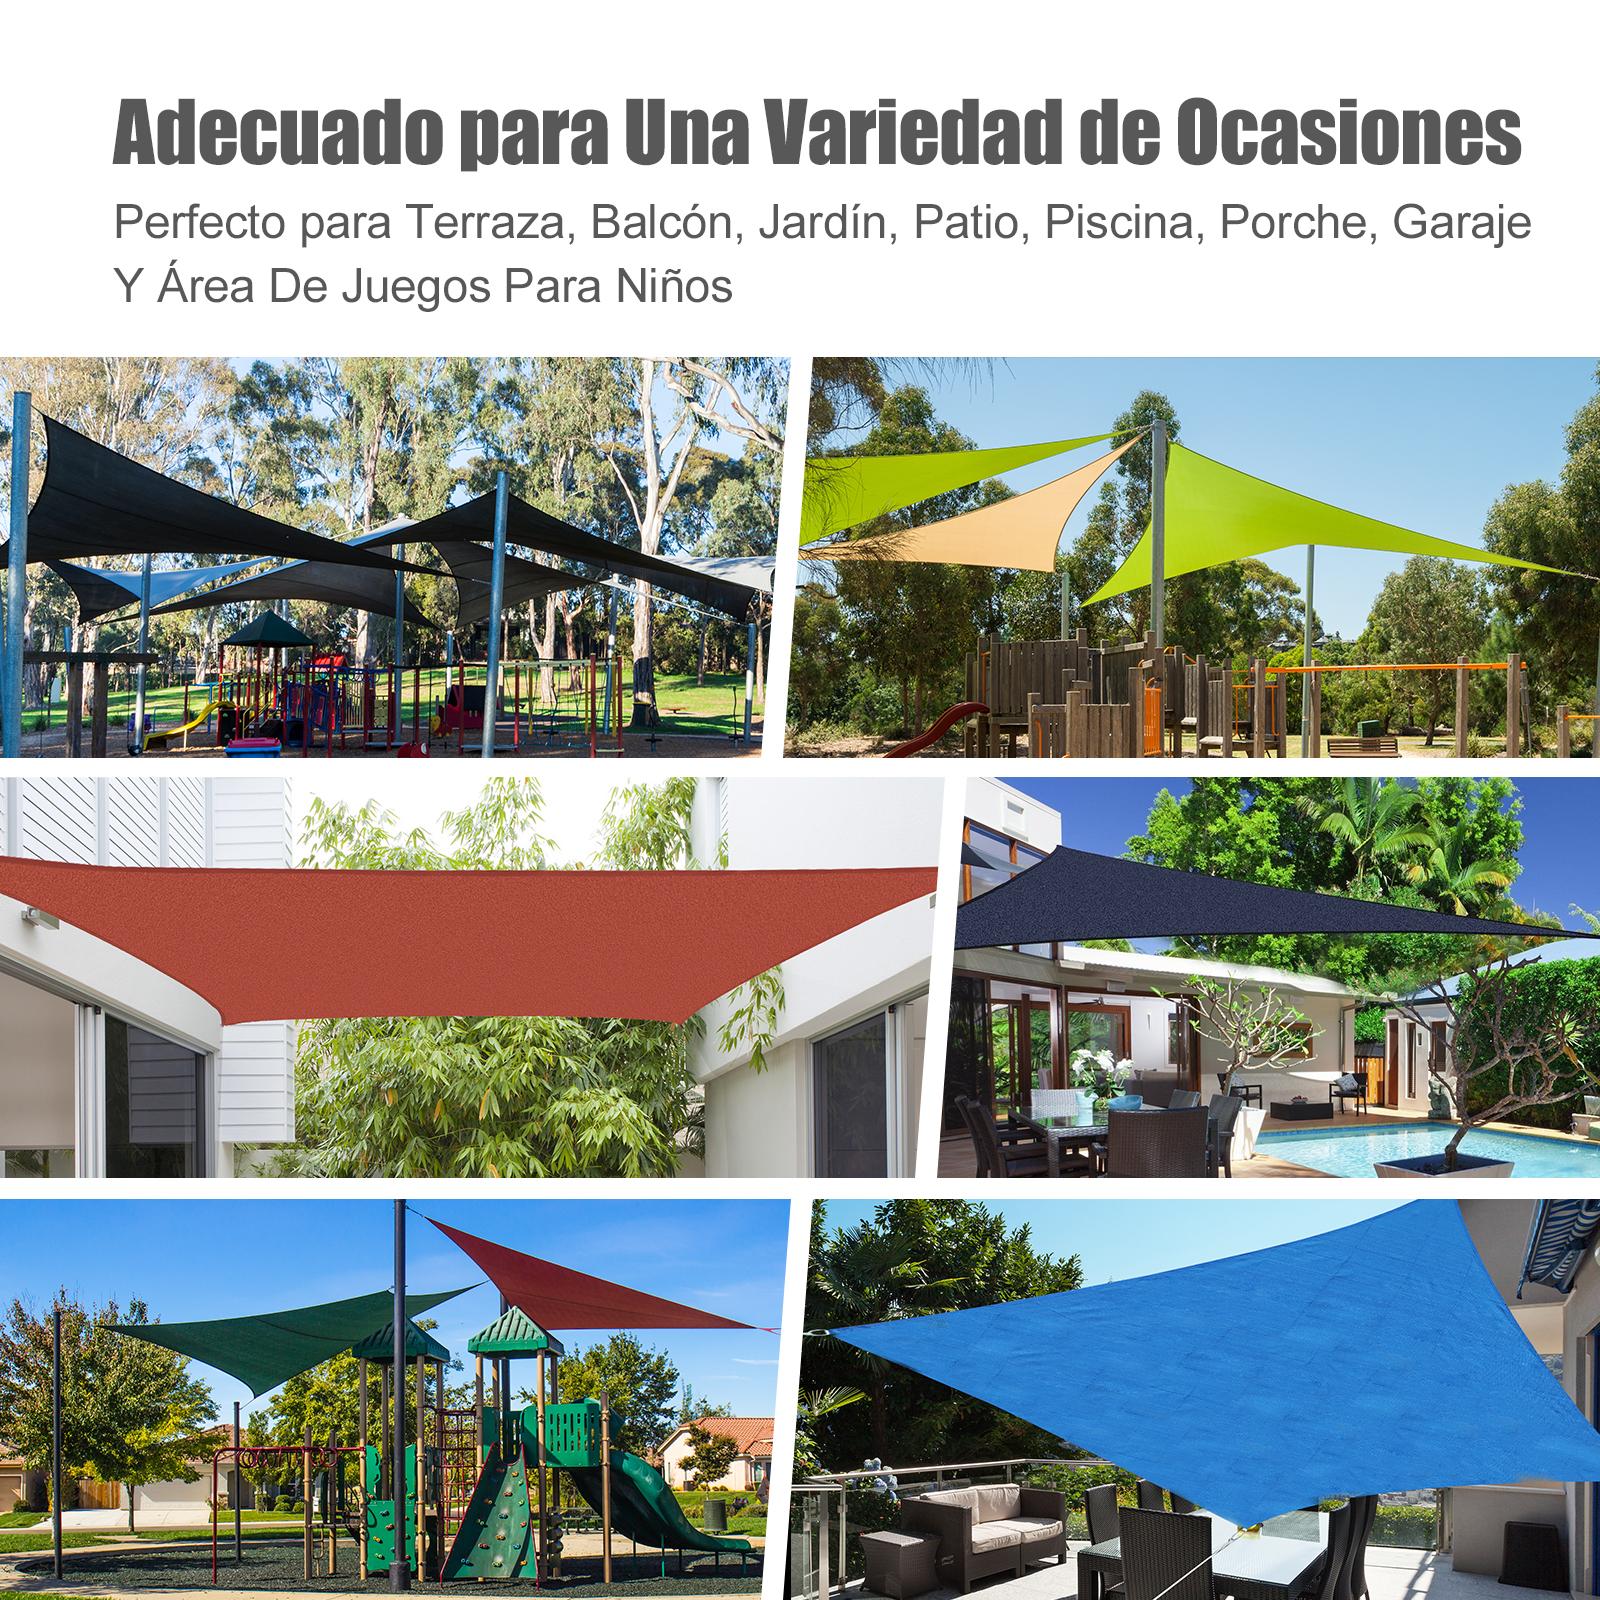 Toldo-Vela-Sombrilla-Parasol-Triangulo-Tejido-de-Poliester-160g-m2-Jardin-Playa miniatura 14